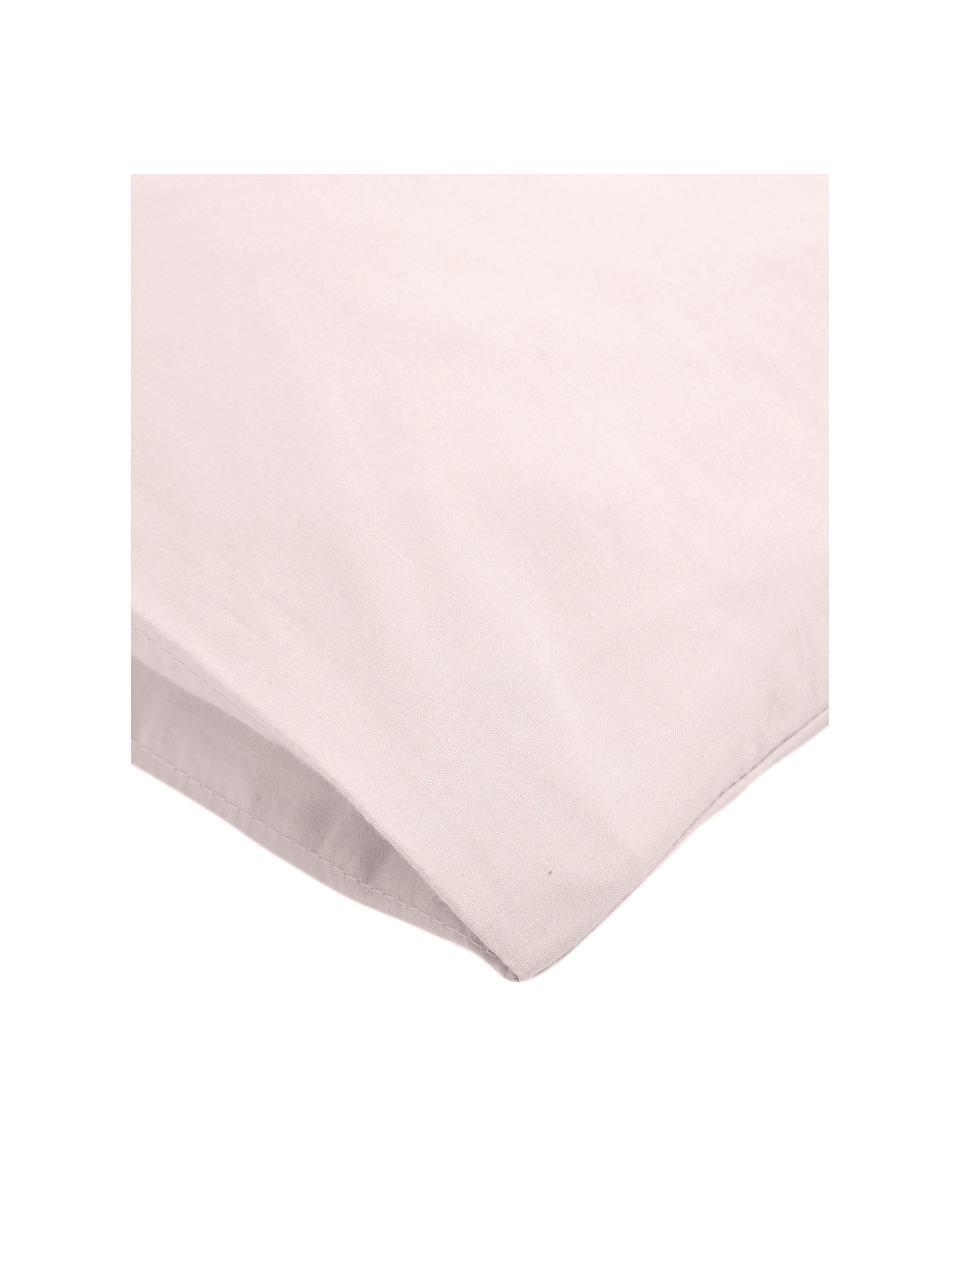 Baumwollperkal-Kopfkissenbezüge Elsie in Rosa, 2 Stück, Webart: Perkal Fadendichte 200 TC, Rosa, 40 x 80 cm